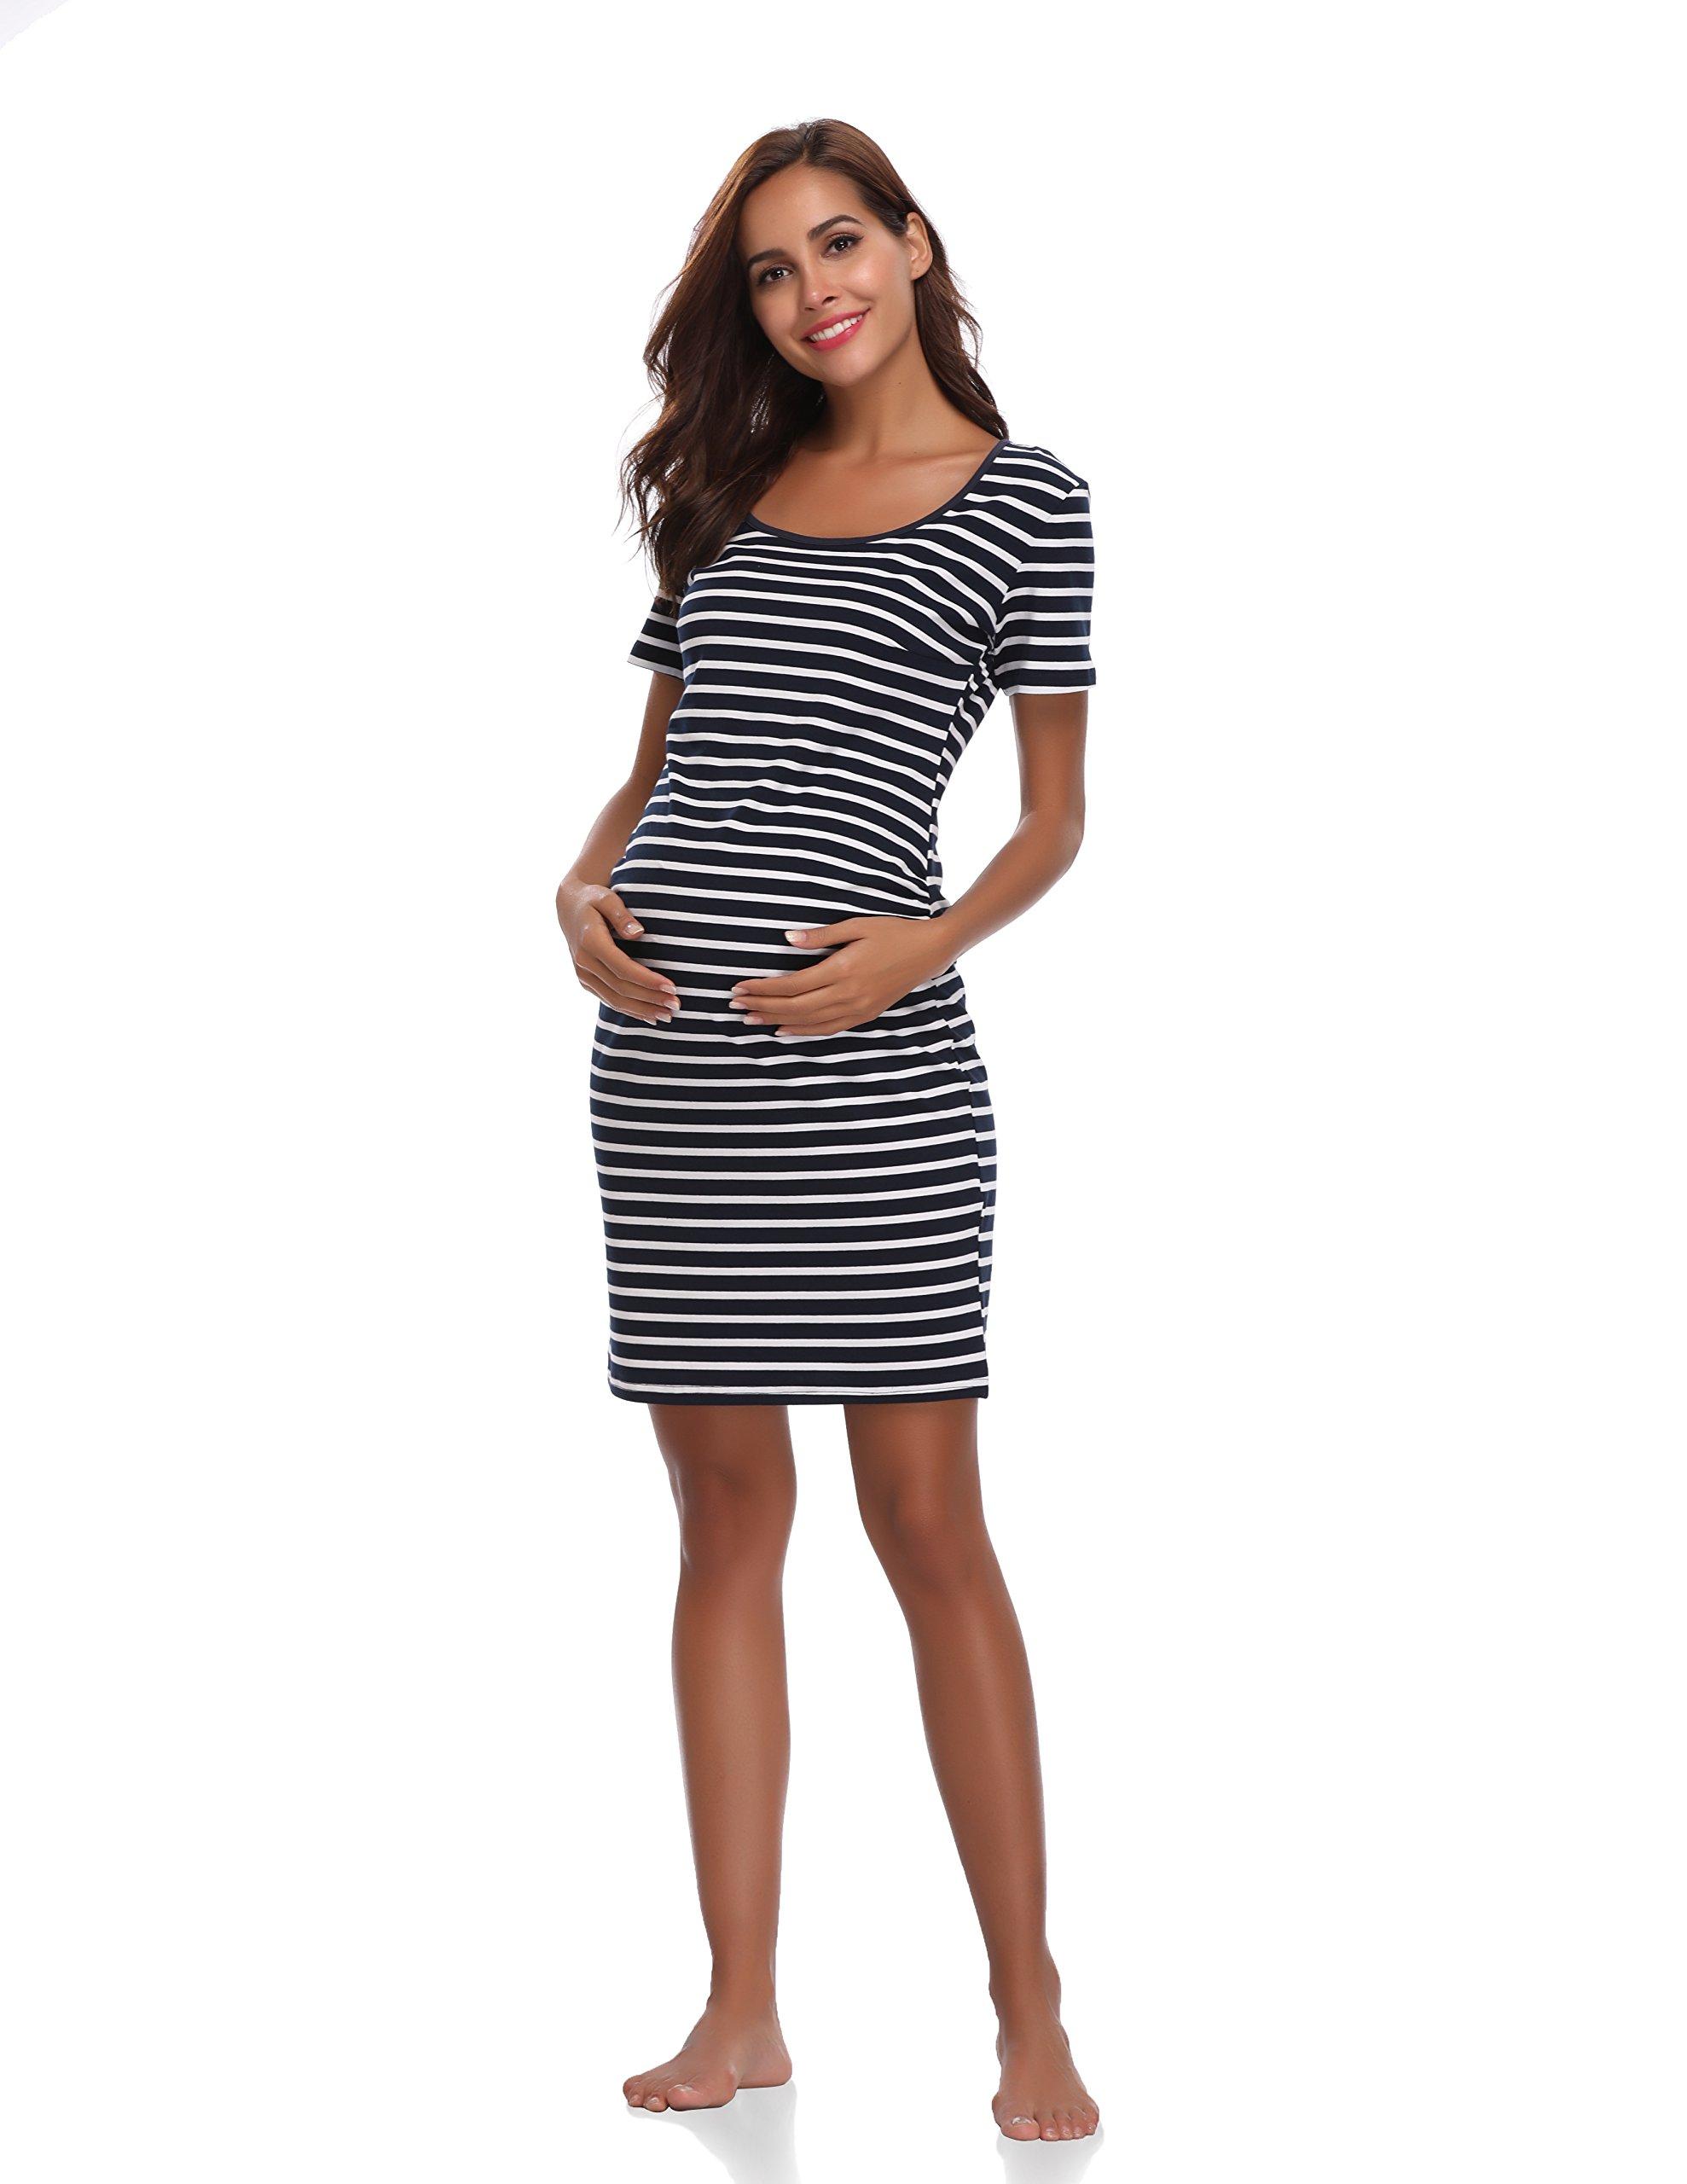 Floating Time Women's Short Sleeve Maternity Dress(S, Navy Stripes)